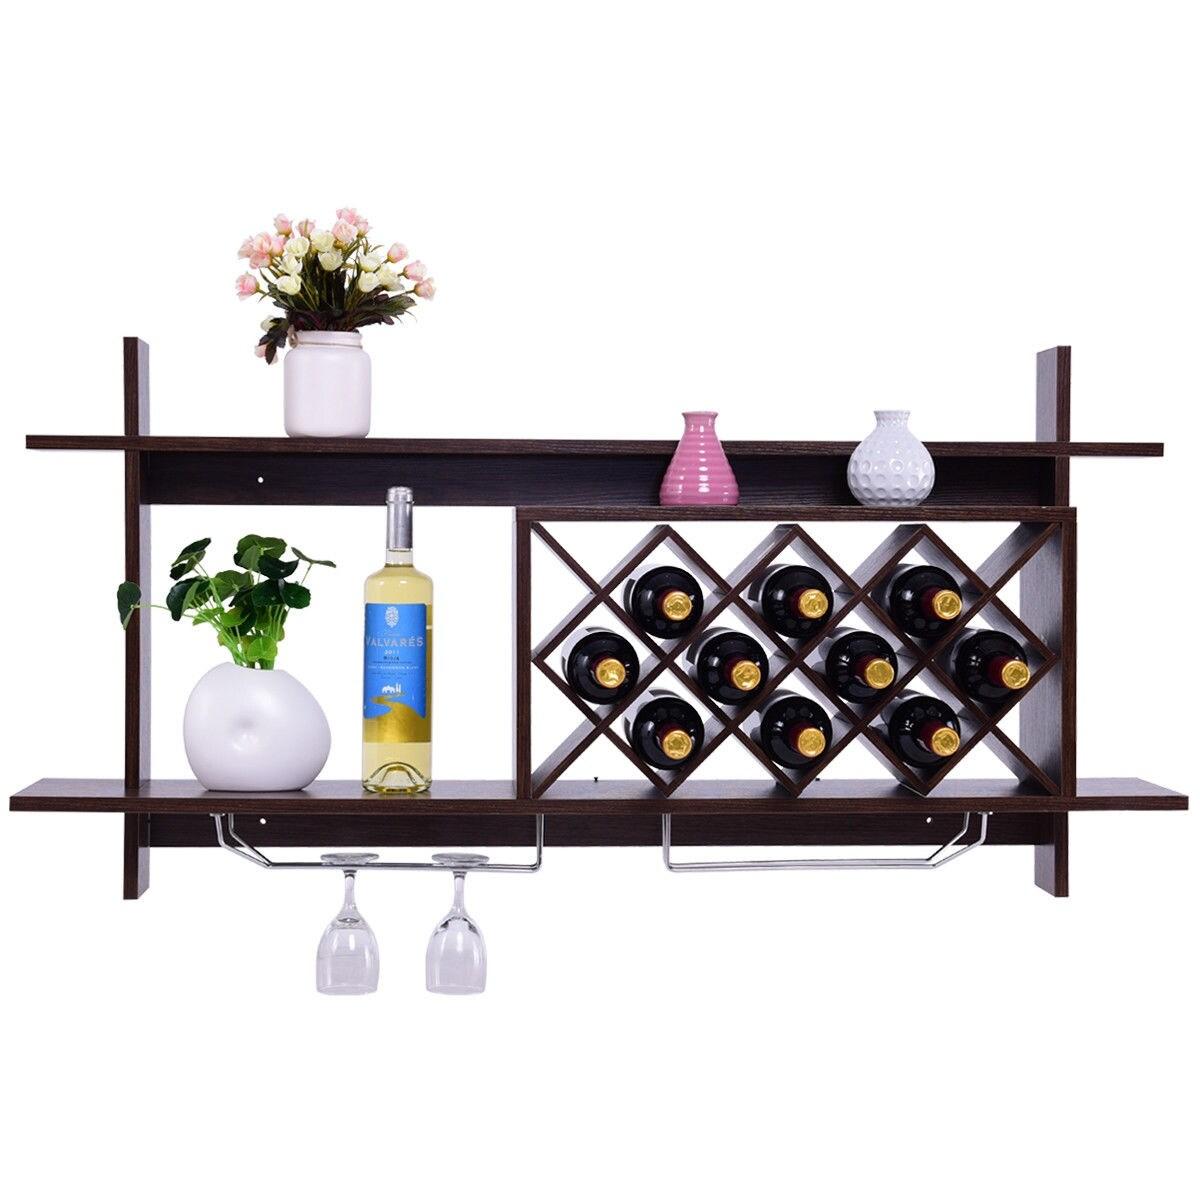 Wall Mounted Wine Rack 5 Bottle Storage Organizer Shelf Holder Room Decor Modern